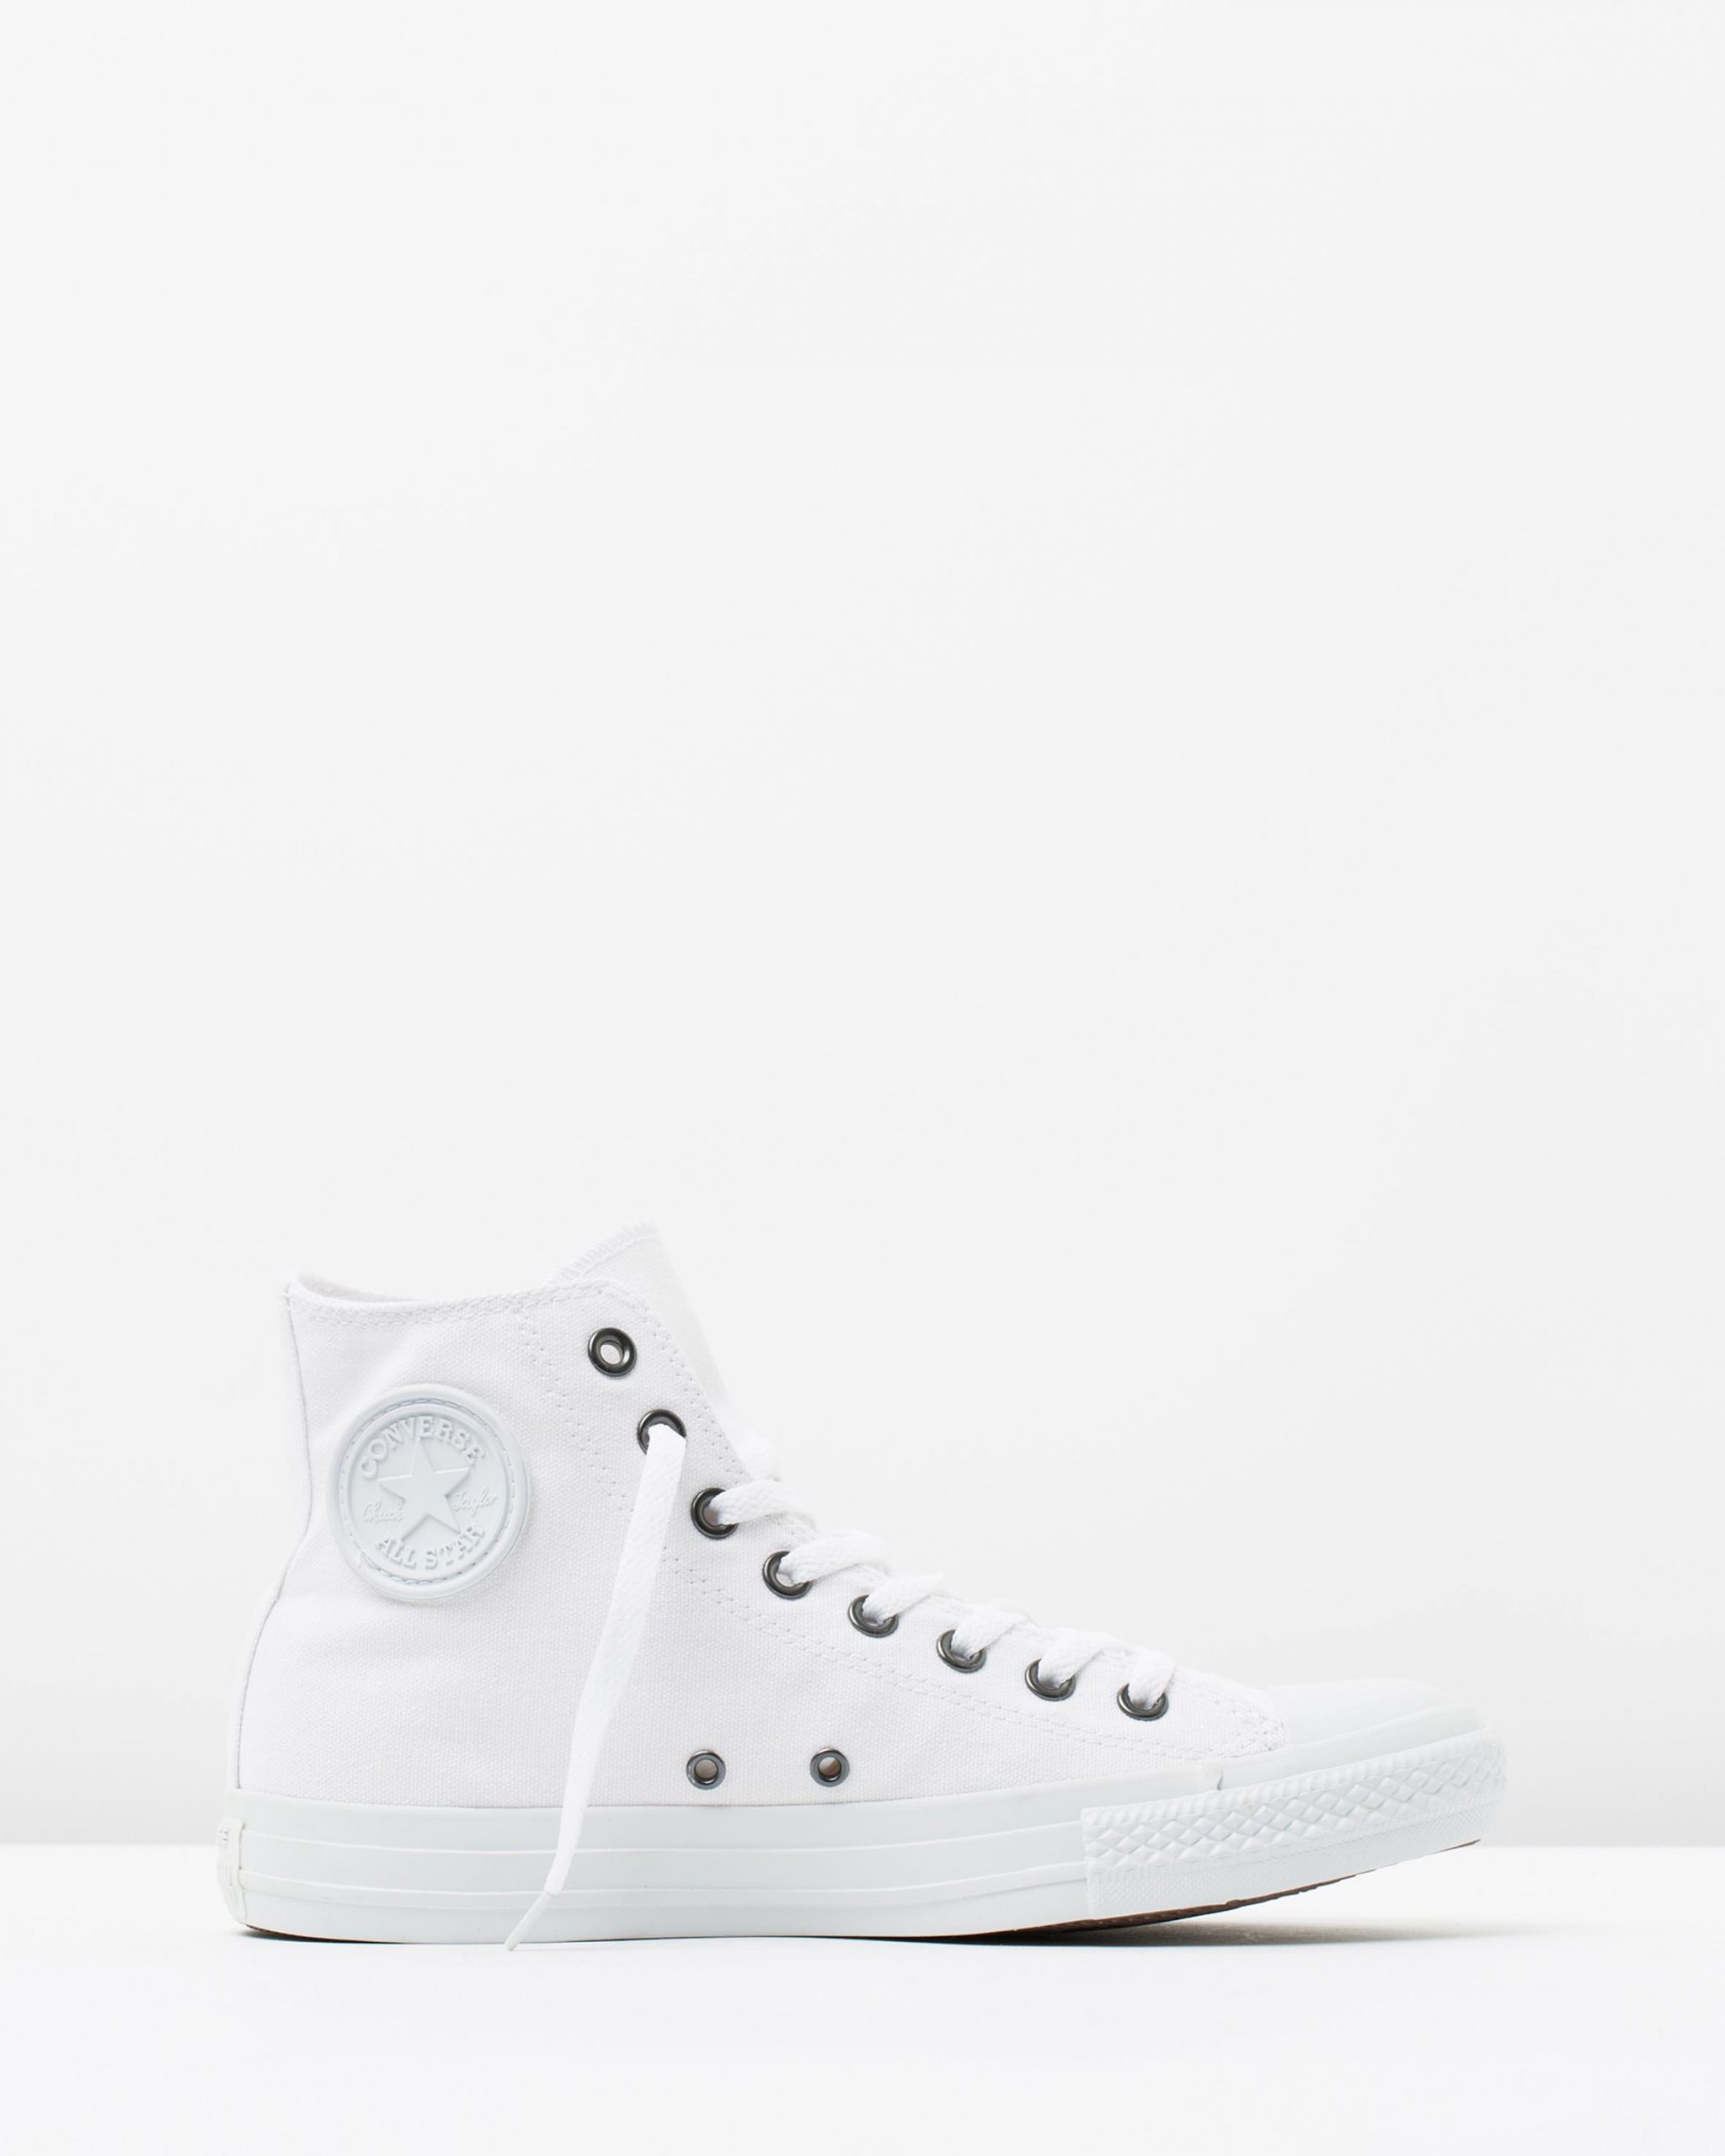 Converse Chuck Taylor All Star Hi Womens White Monochrome